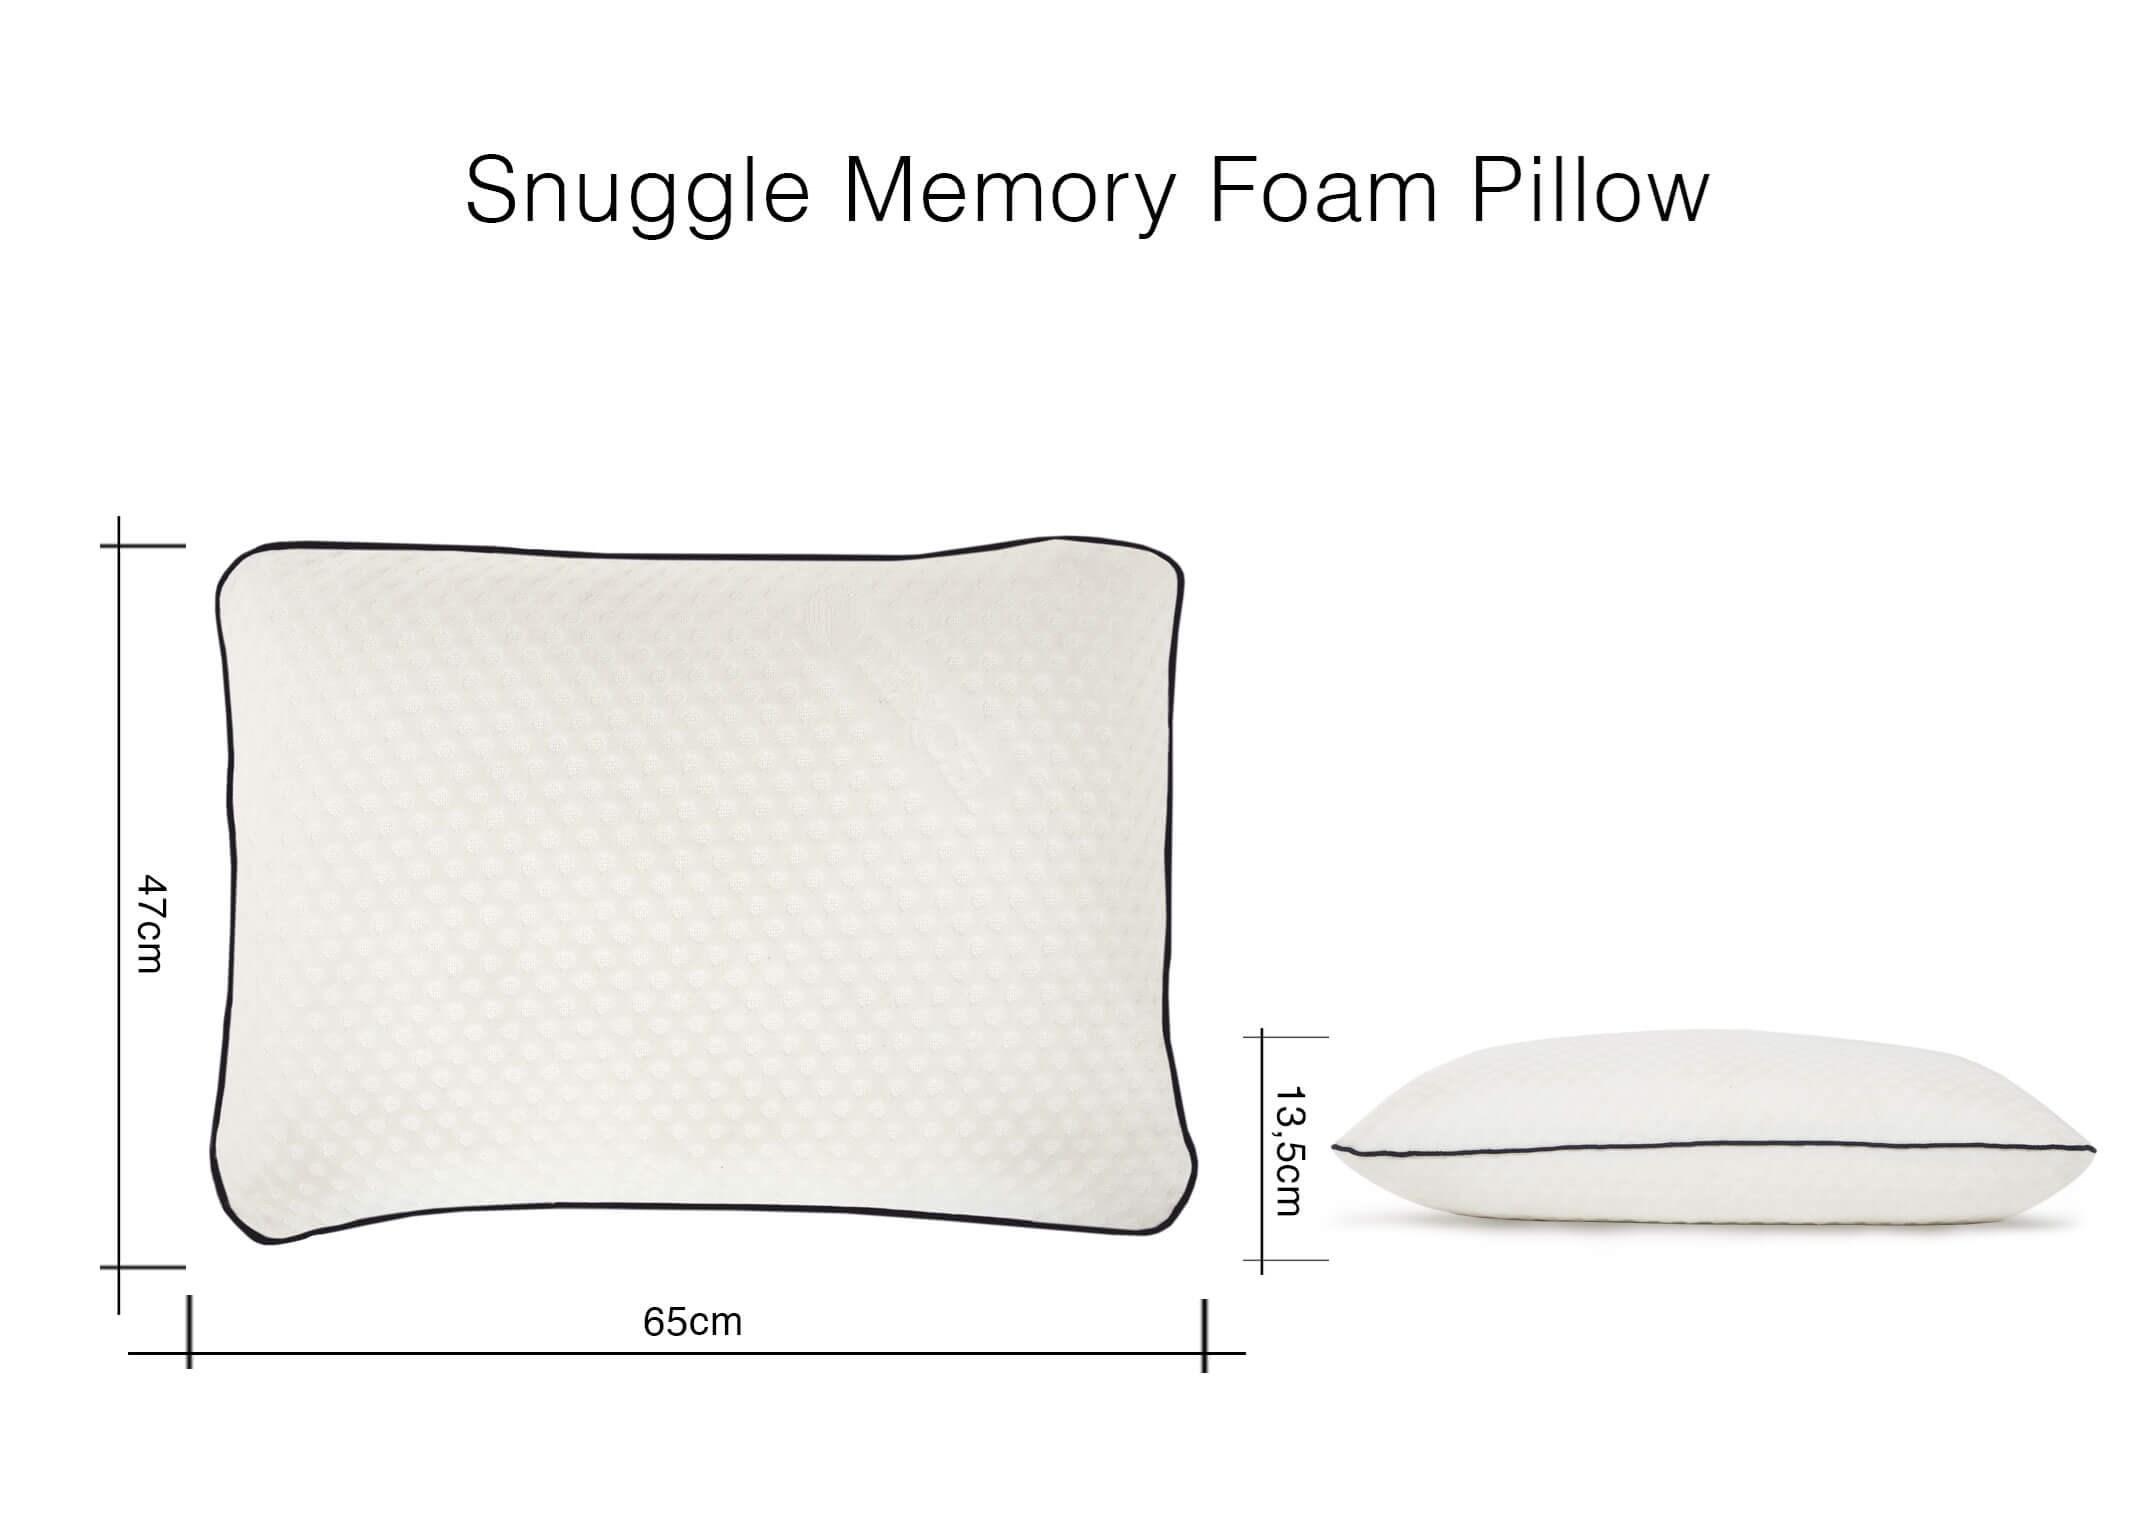 memory foam pillow snuggle